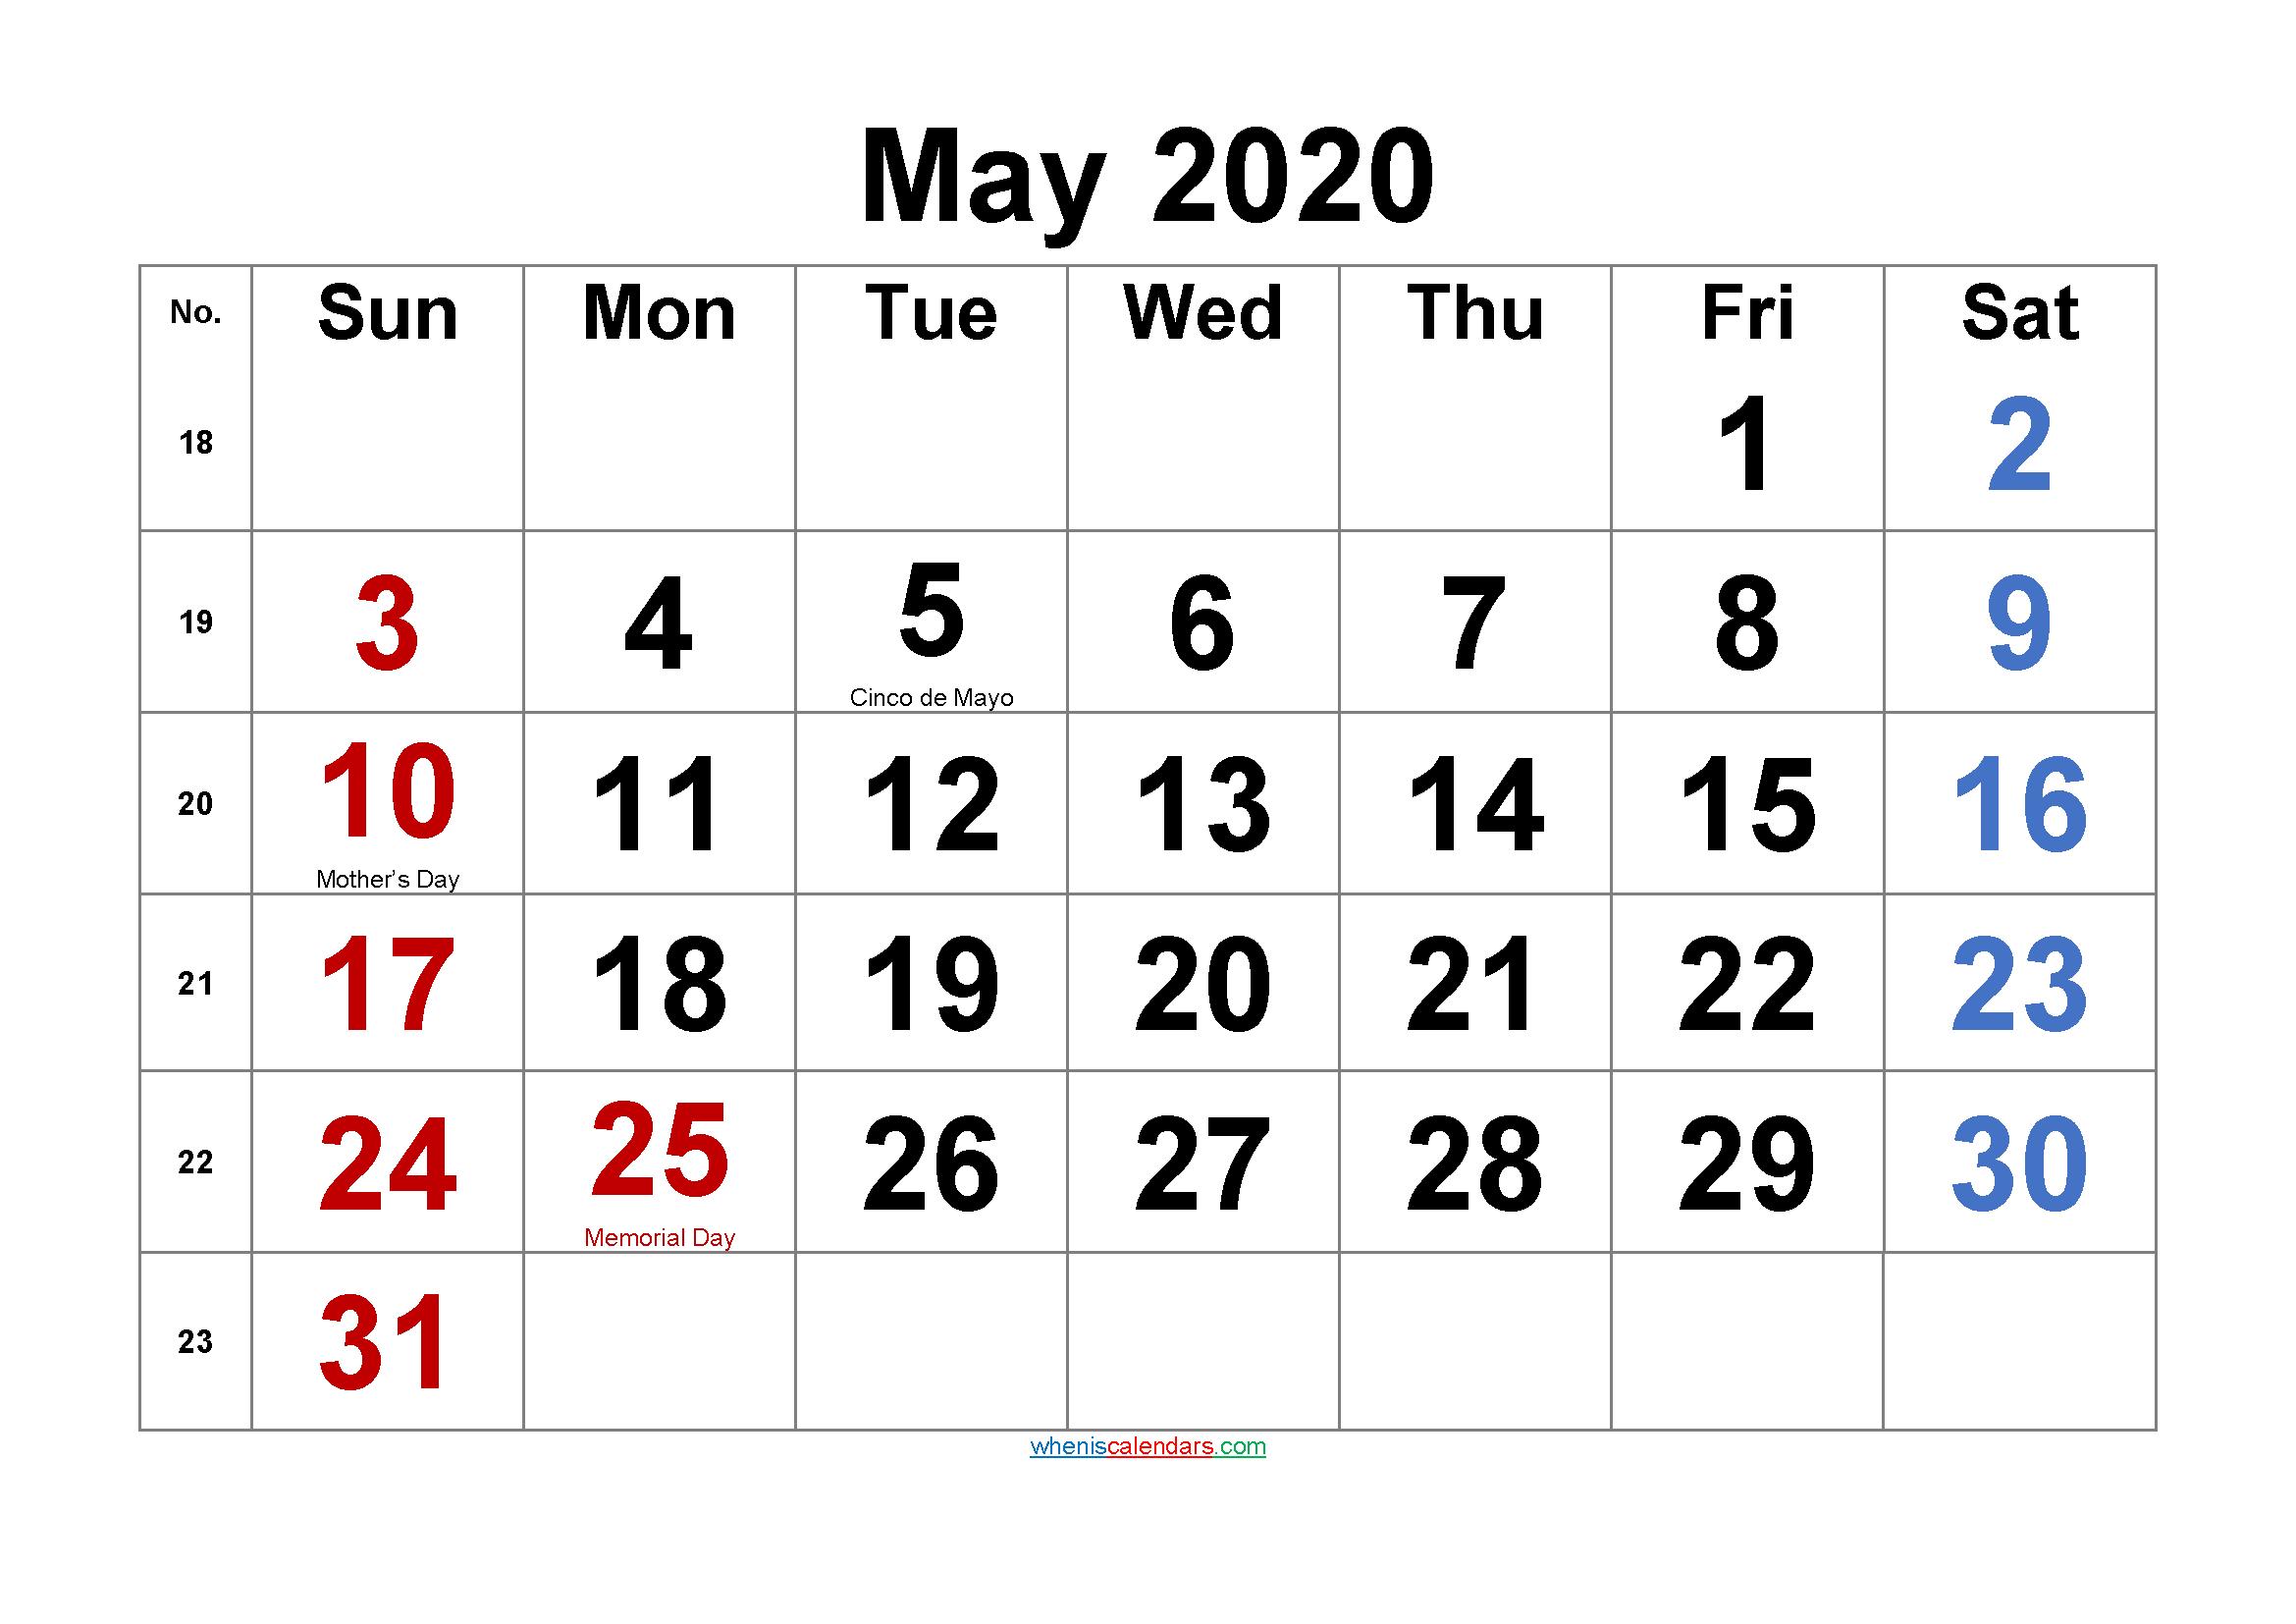 Free Printable MAY 2020 Calendar with Holidays